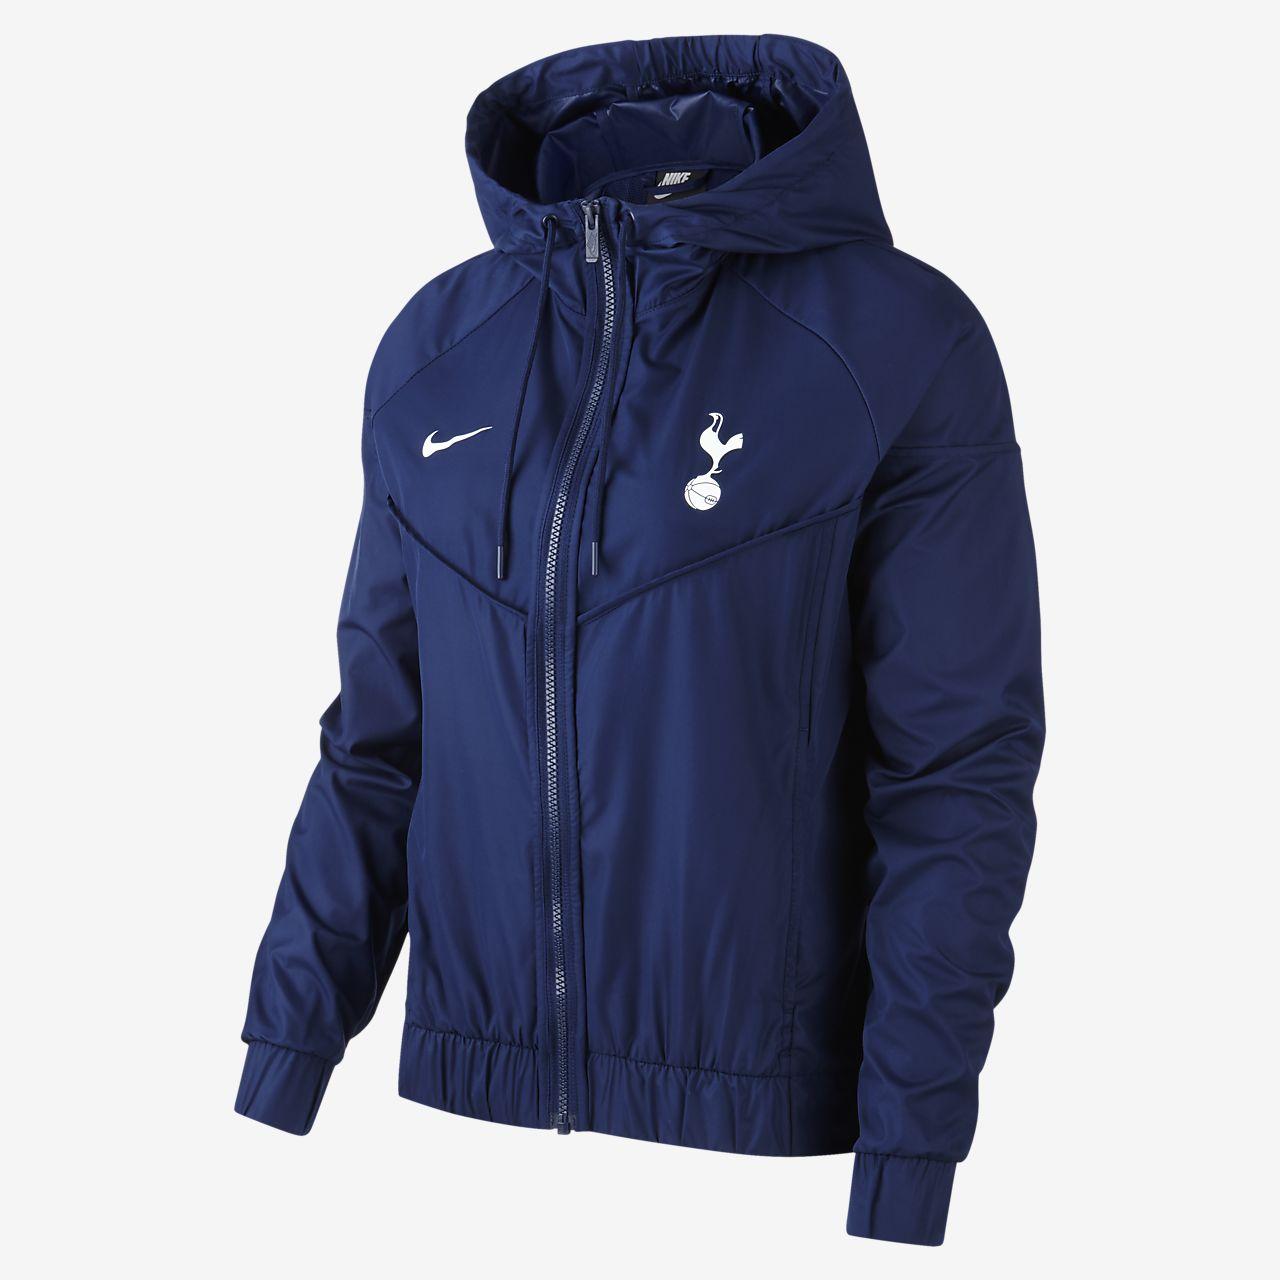 Tottenham Hotspur Windrunner Damenjacke